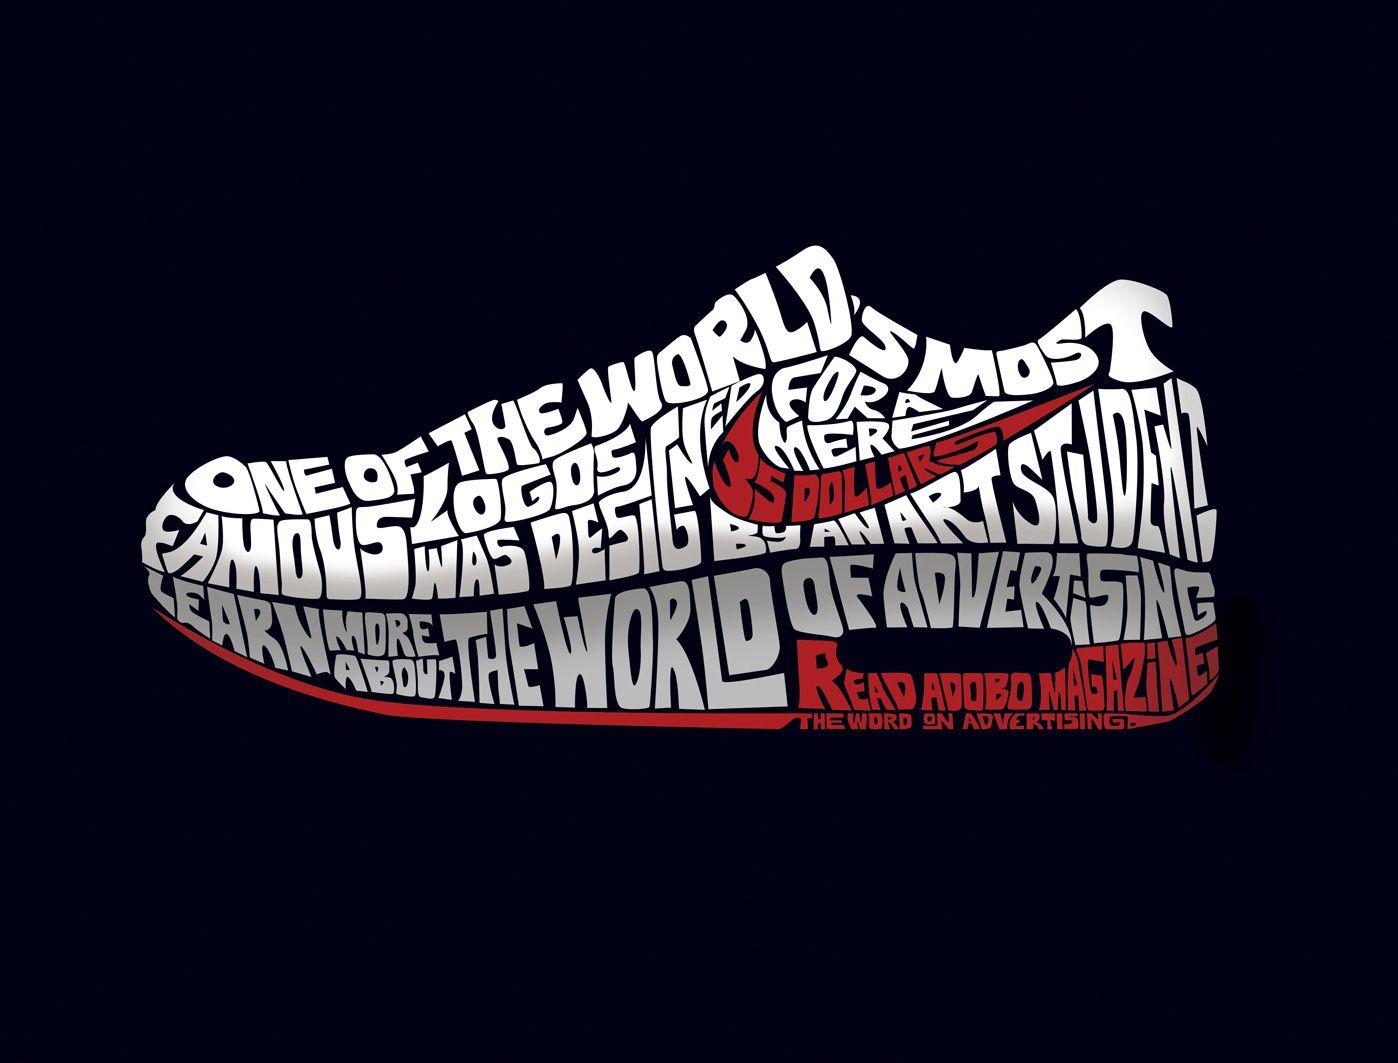 reputable site 46e3a c4f85 Adventure Graphics Nike vs Adidas, publicidad fuera de serie.